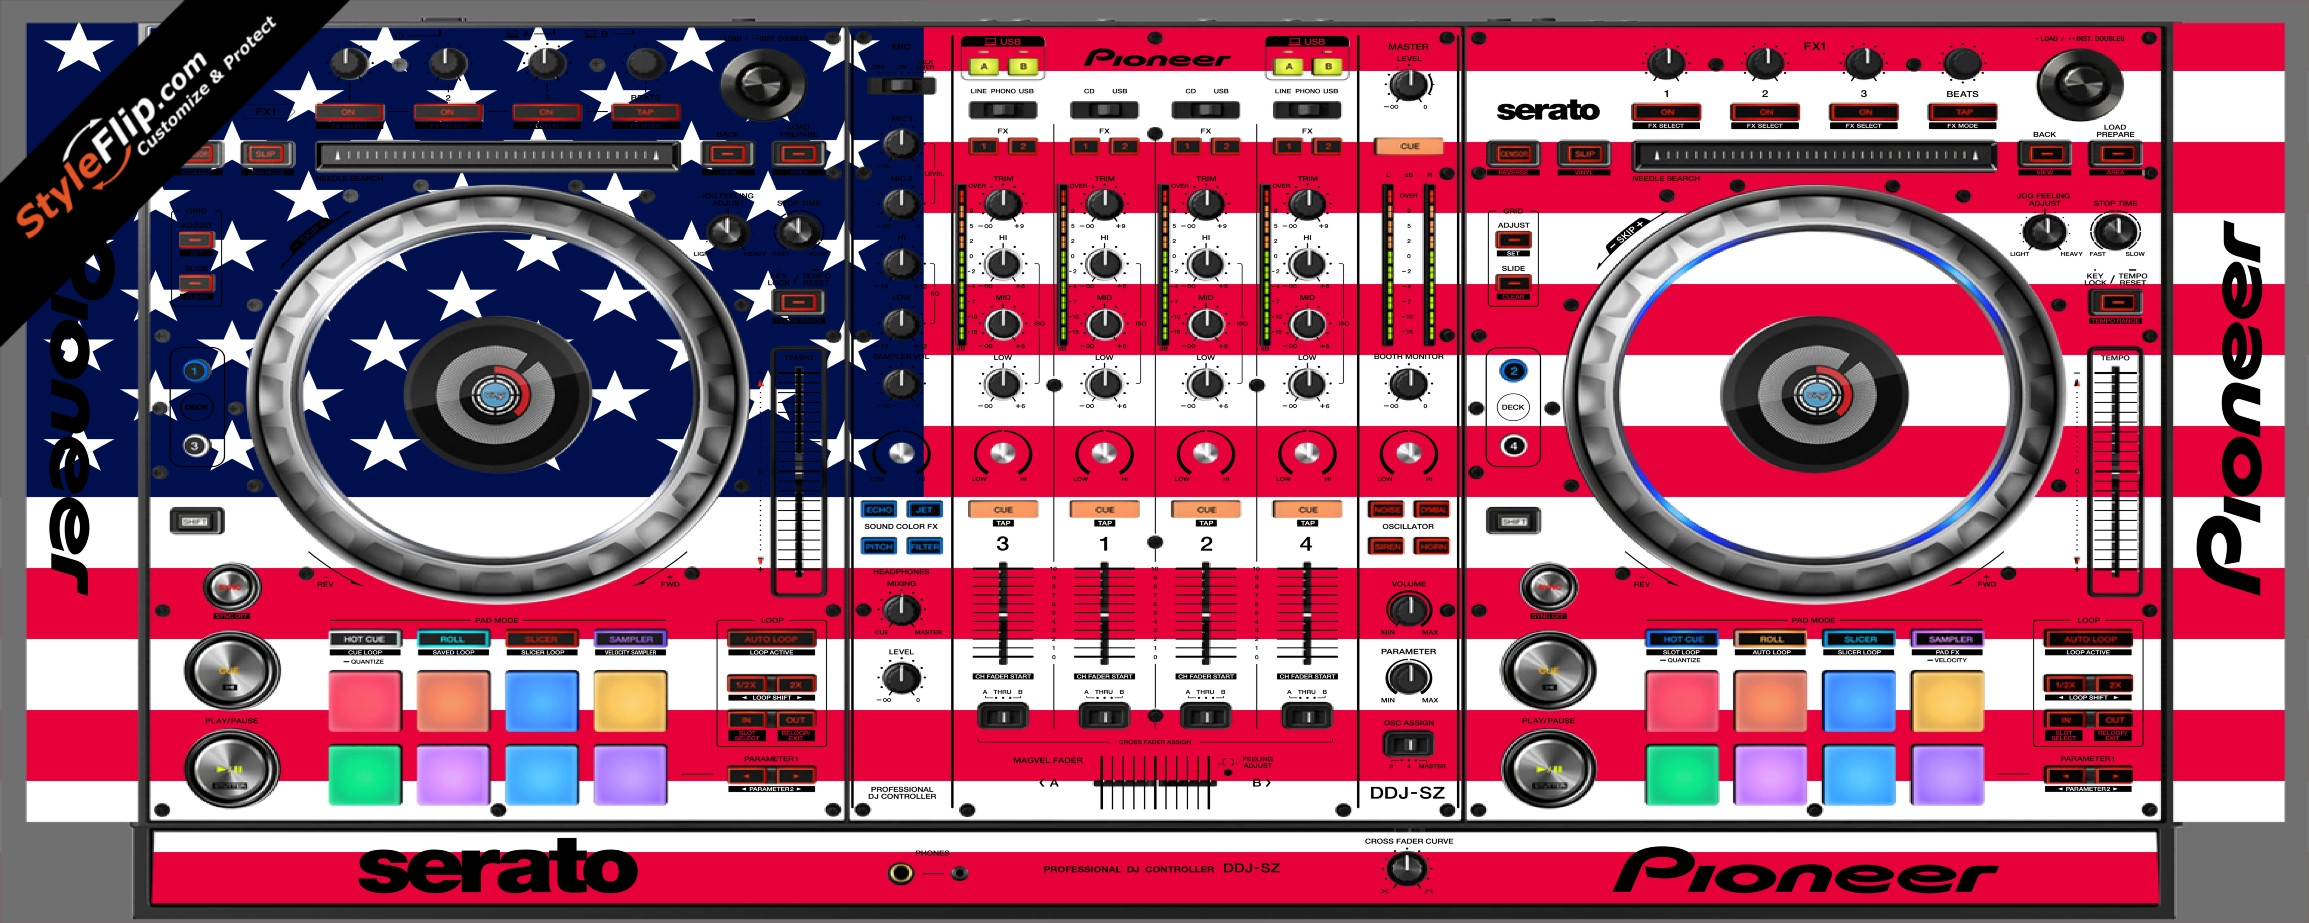 United States Of America Pioneer DDJ-SZ